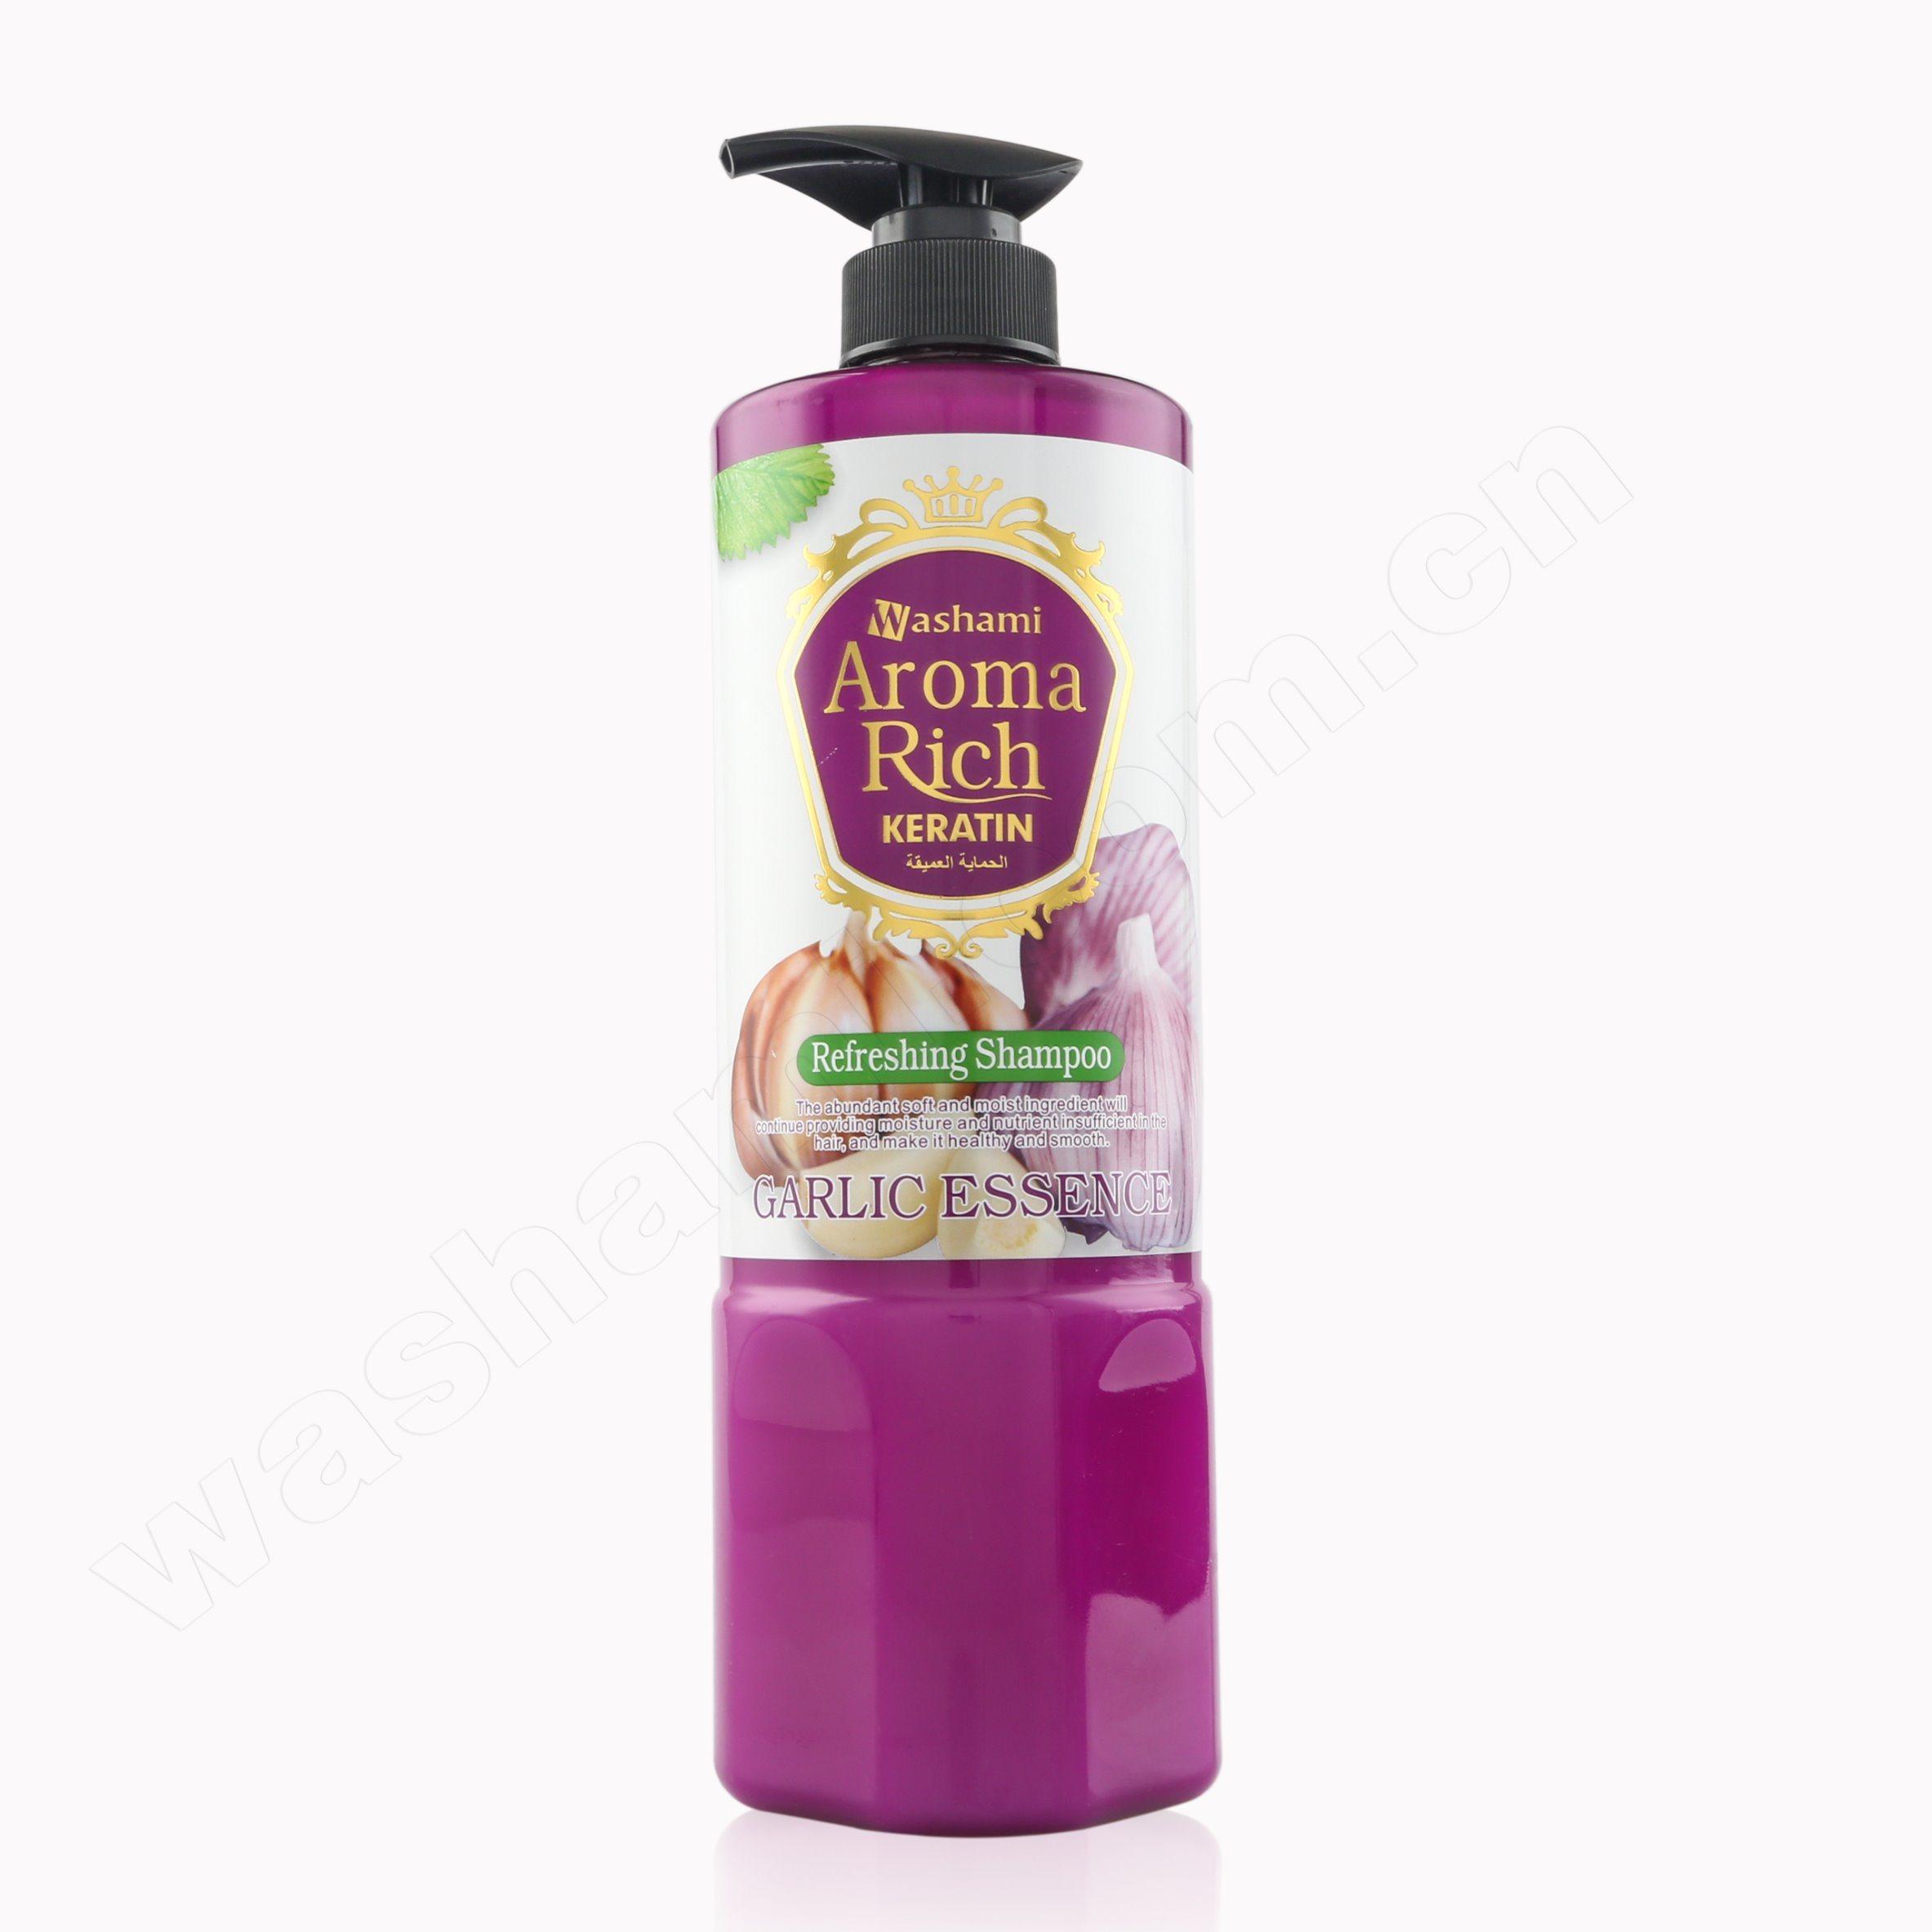 Washami 1200ml Refreshing Garlic Hair Shampoo Conditioner